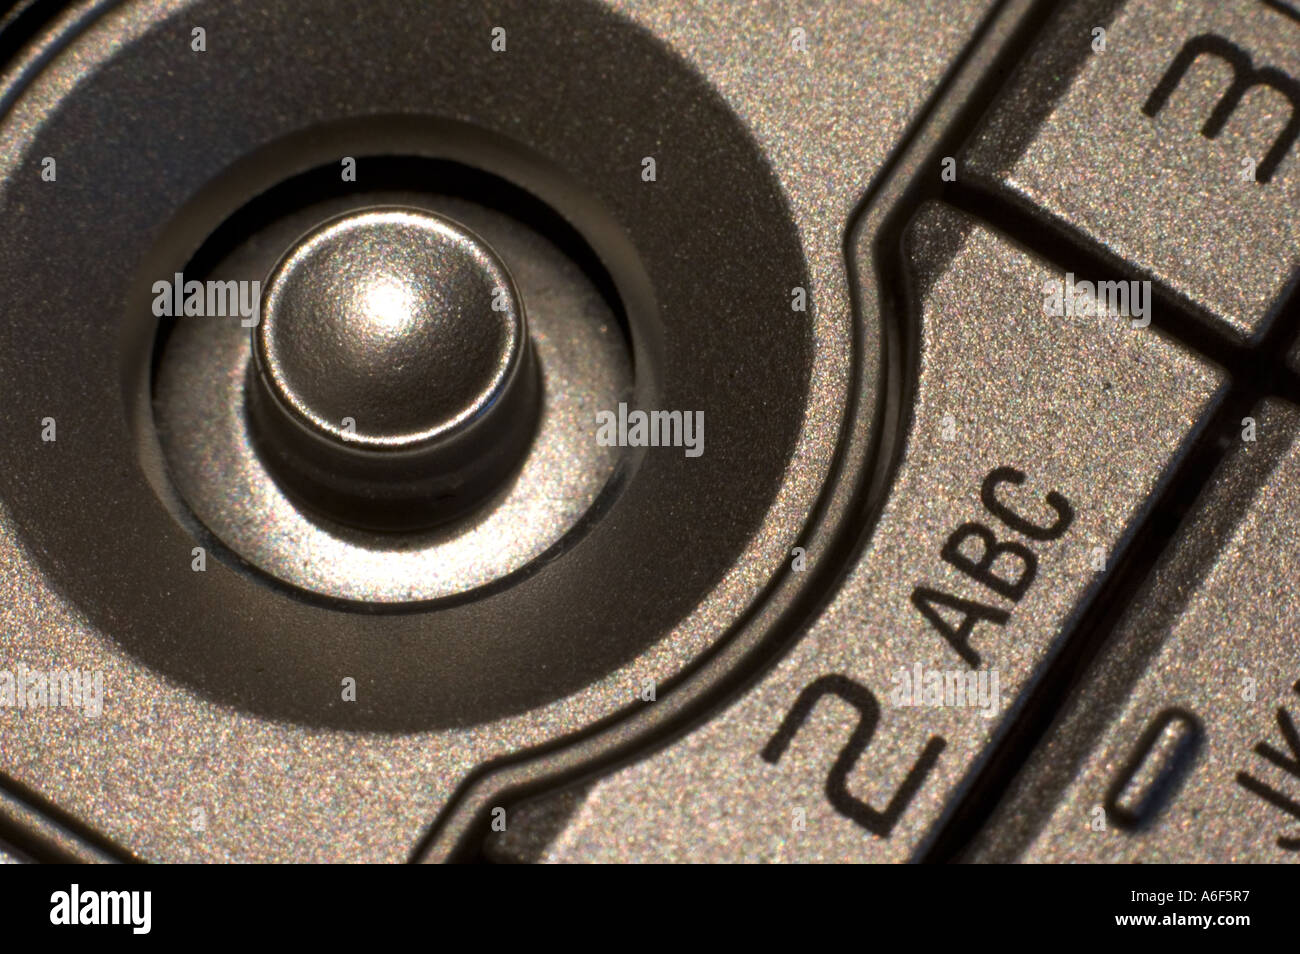 Toggle button on Nokia mobile phone. Stock Photo